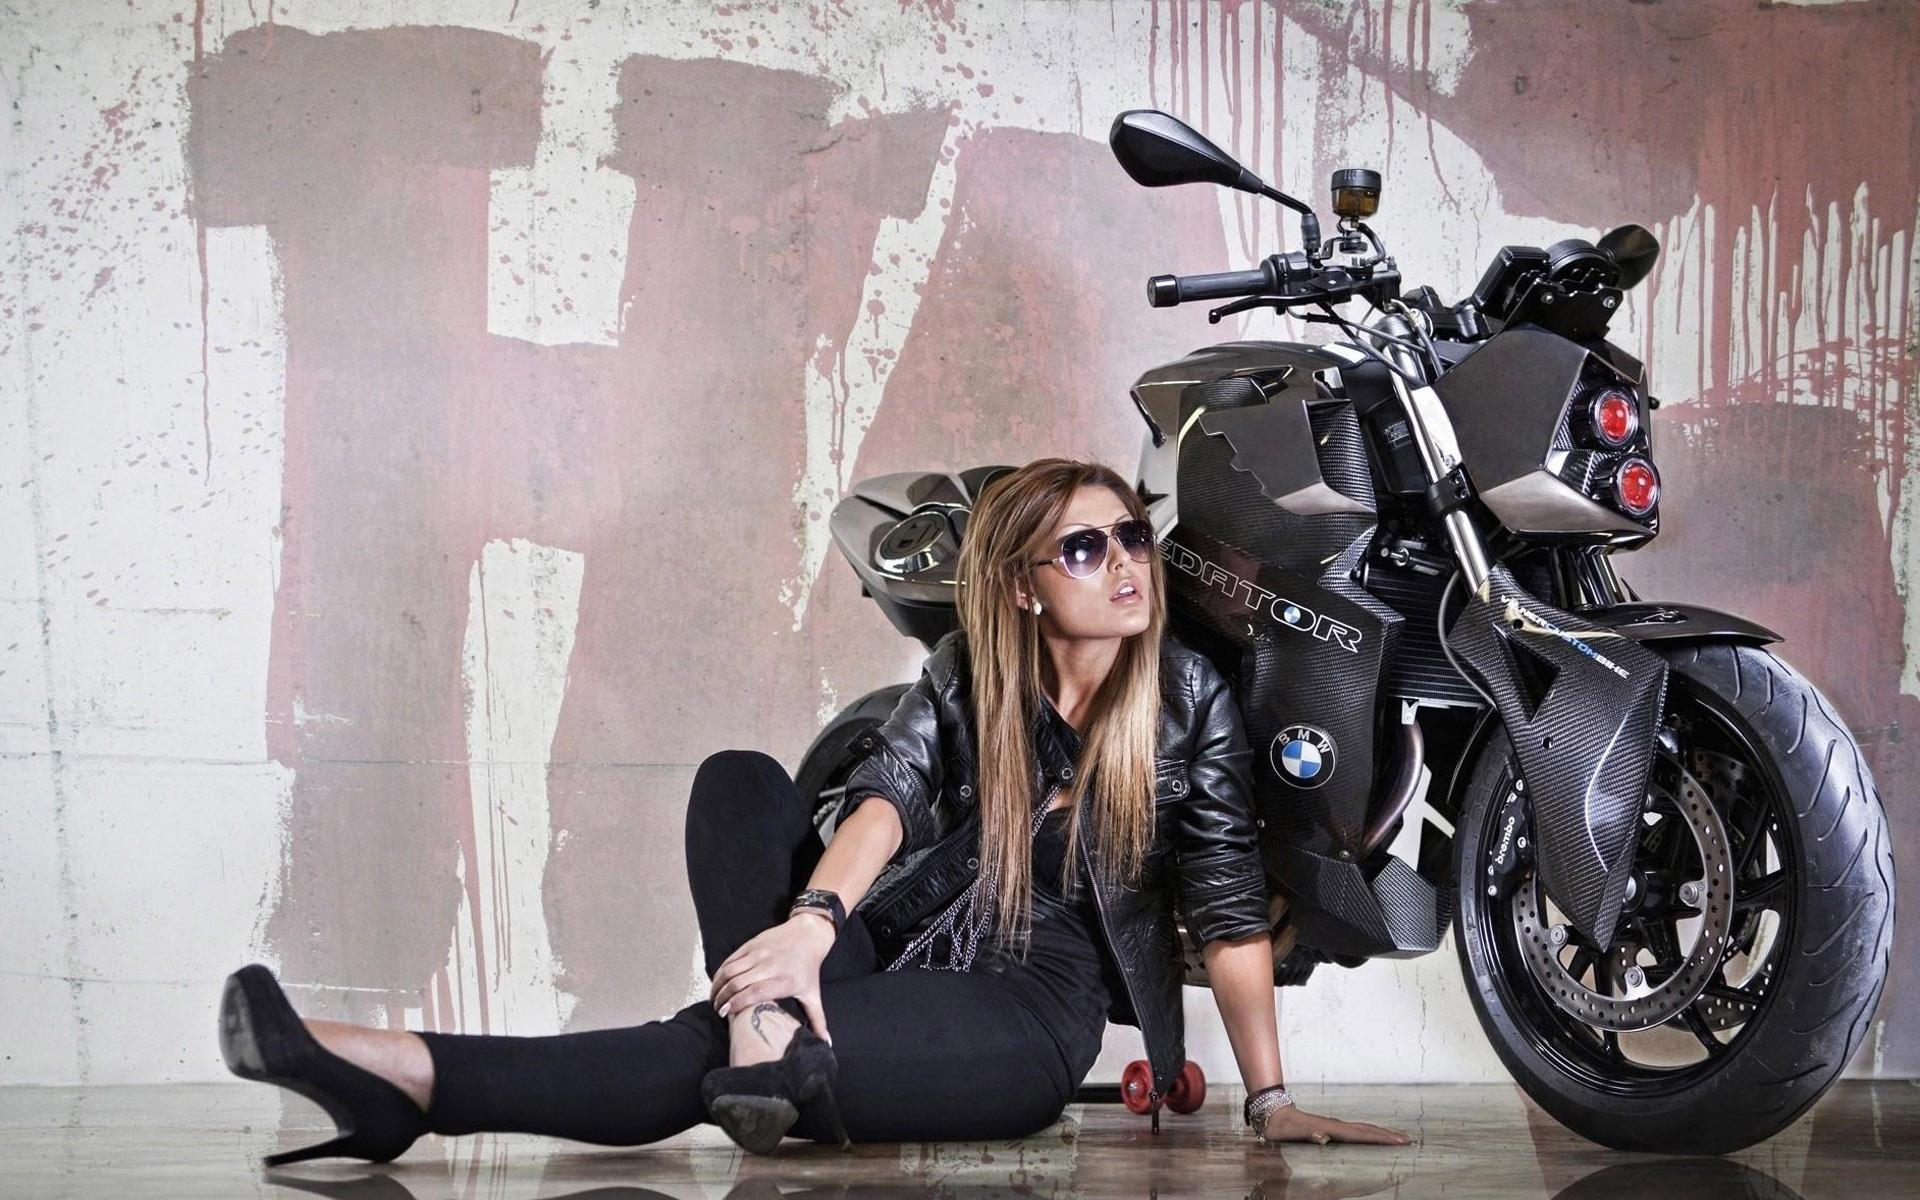 BMW F800R Girl Motorcycle HD Wallpaper 1920x1200